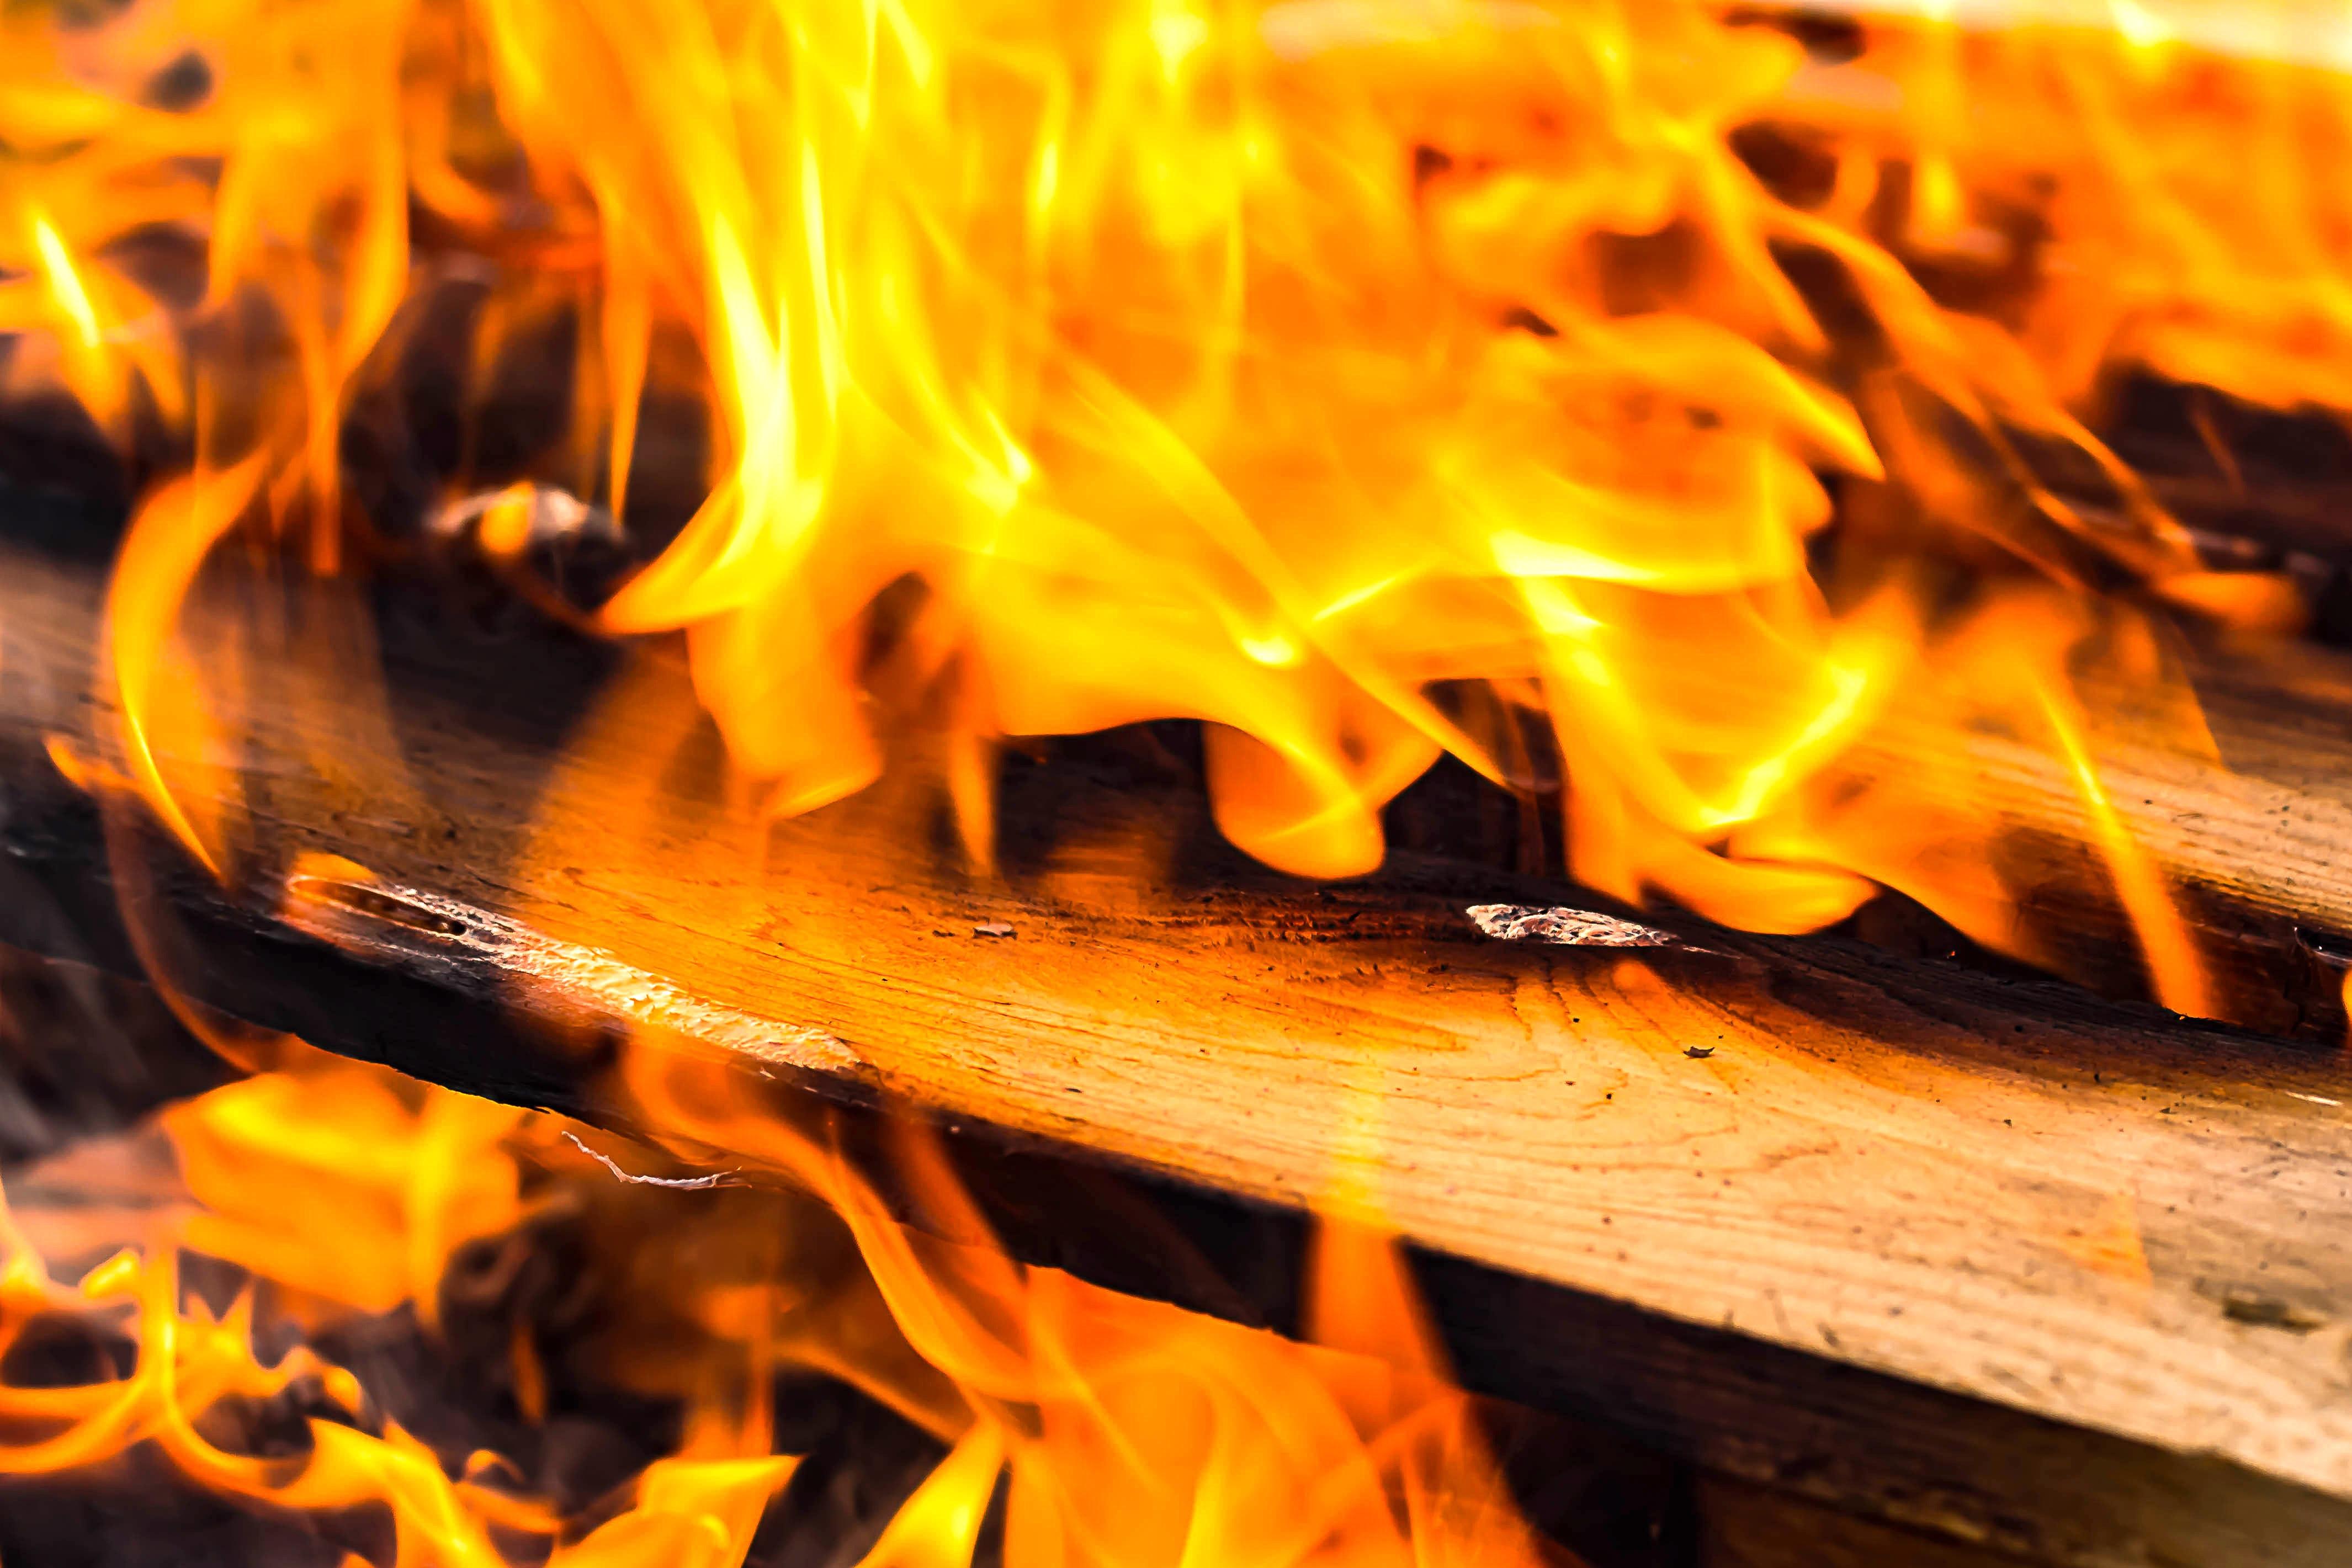 Burning Wood, Fuel, Wood, Fire, Burning, HQ Photo